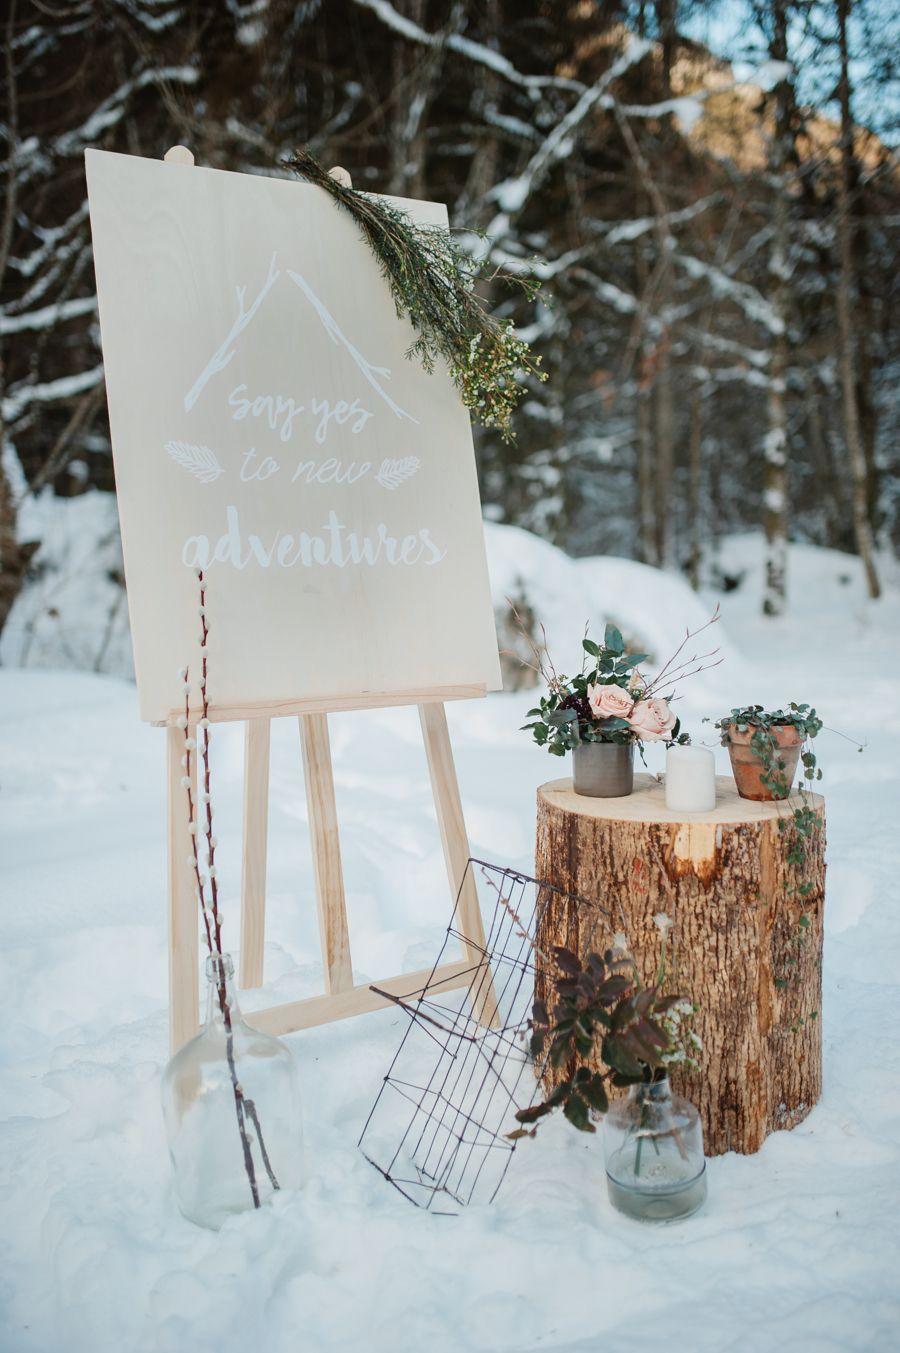 Un Mariage D Hiver Scandi Folk Dans Les Alpes Fleuriste Lyon